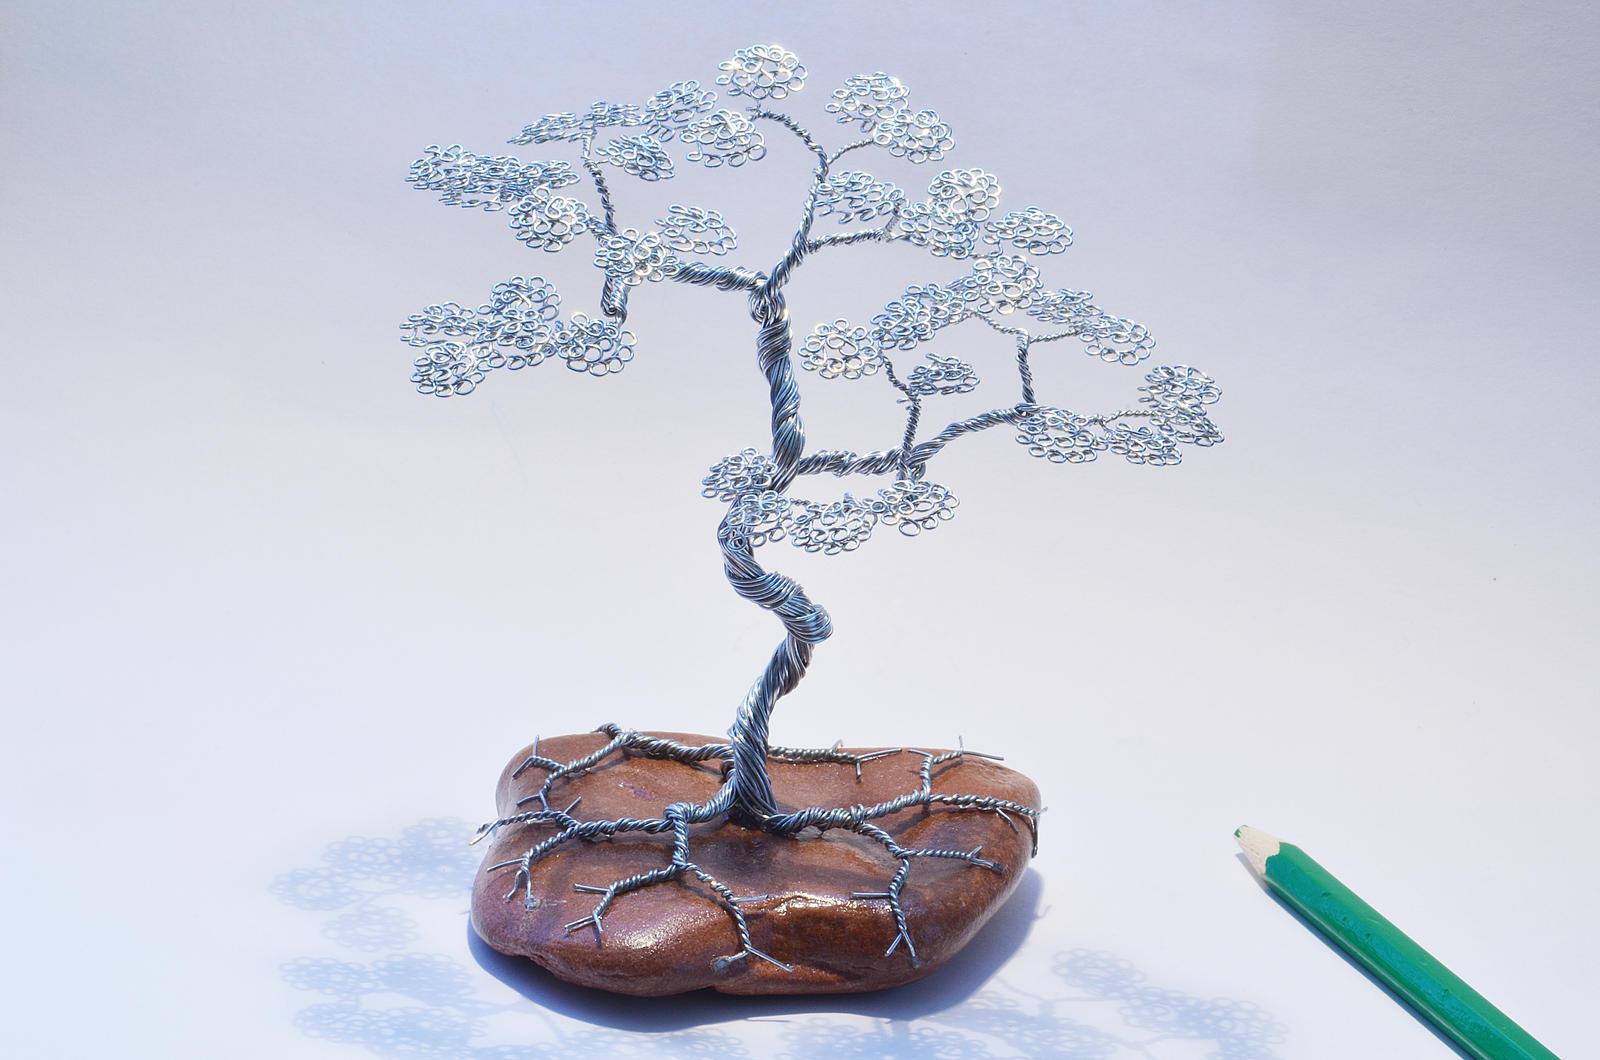 Wire tree sculpture bonsai by minskis on DeviantArt